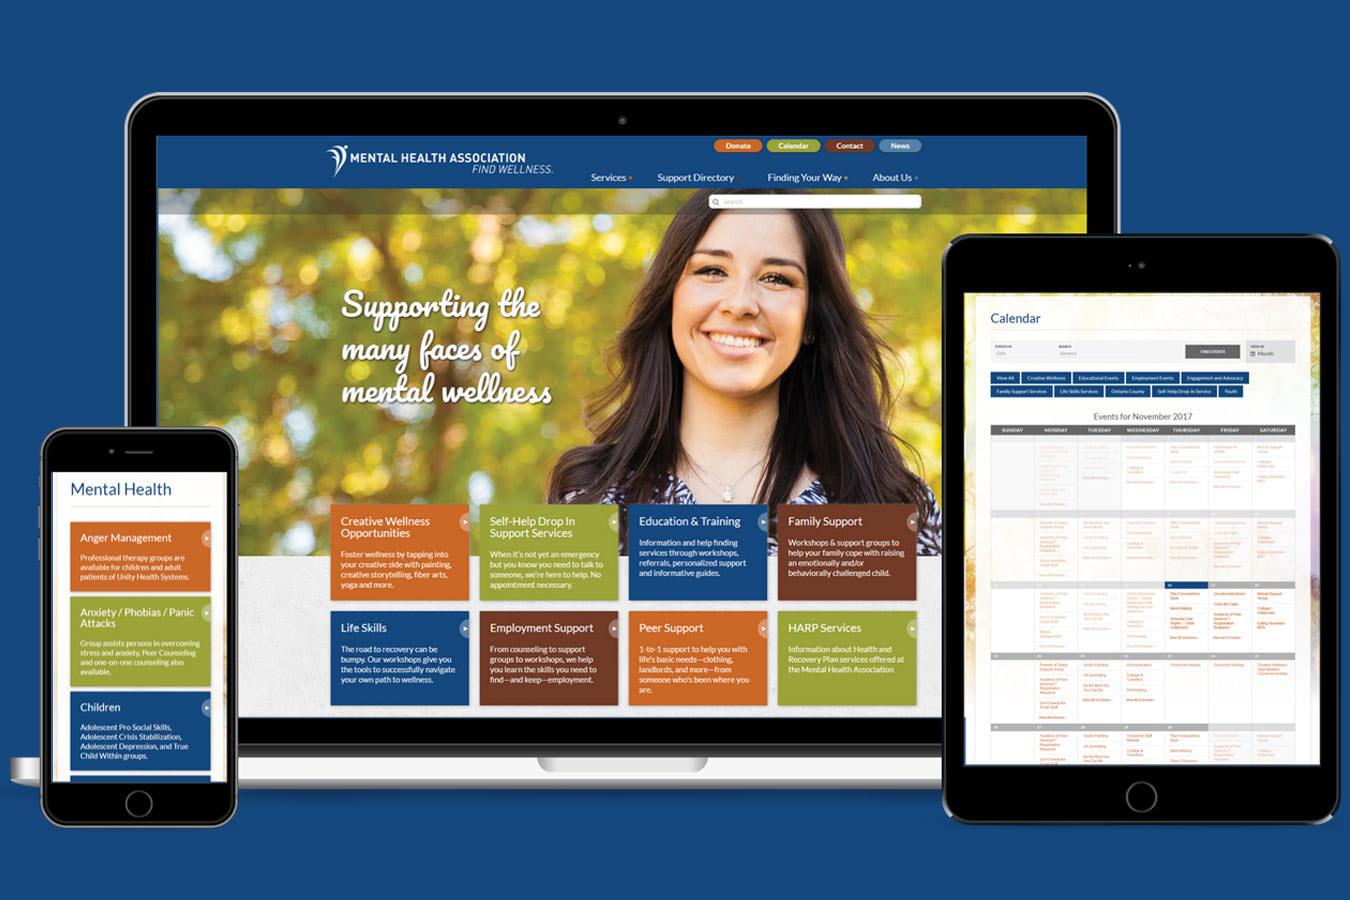 Mental Health Association website on multiple devices